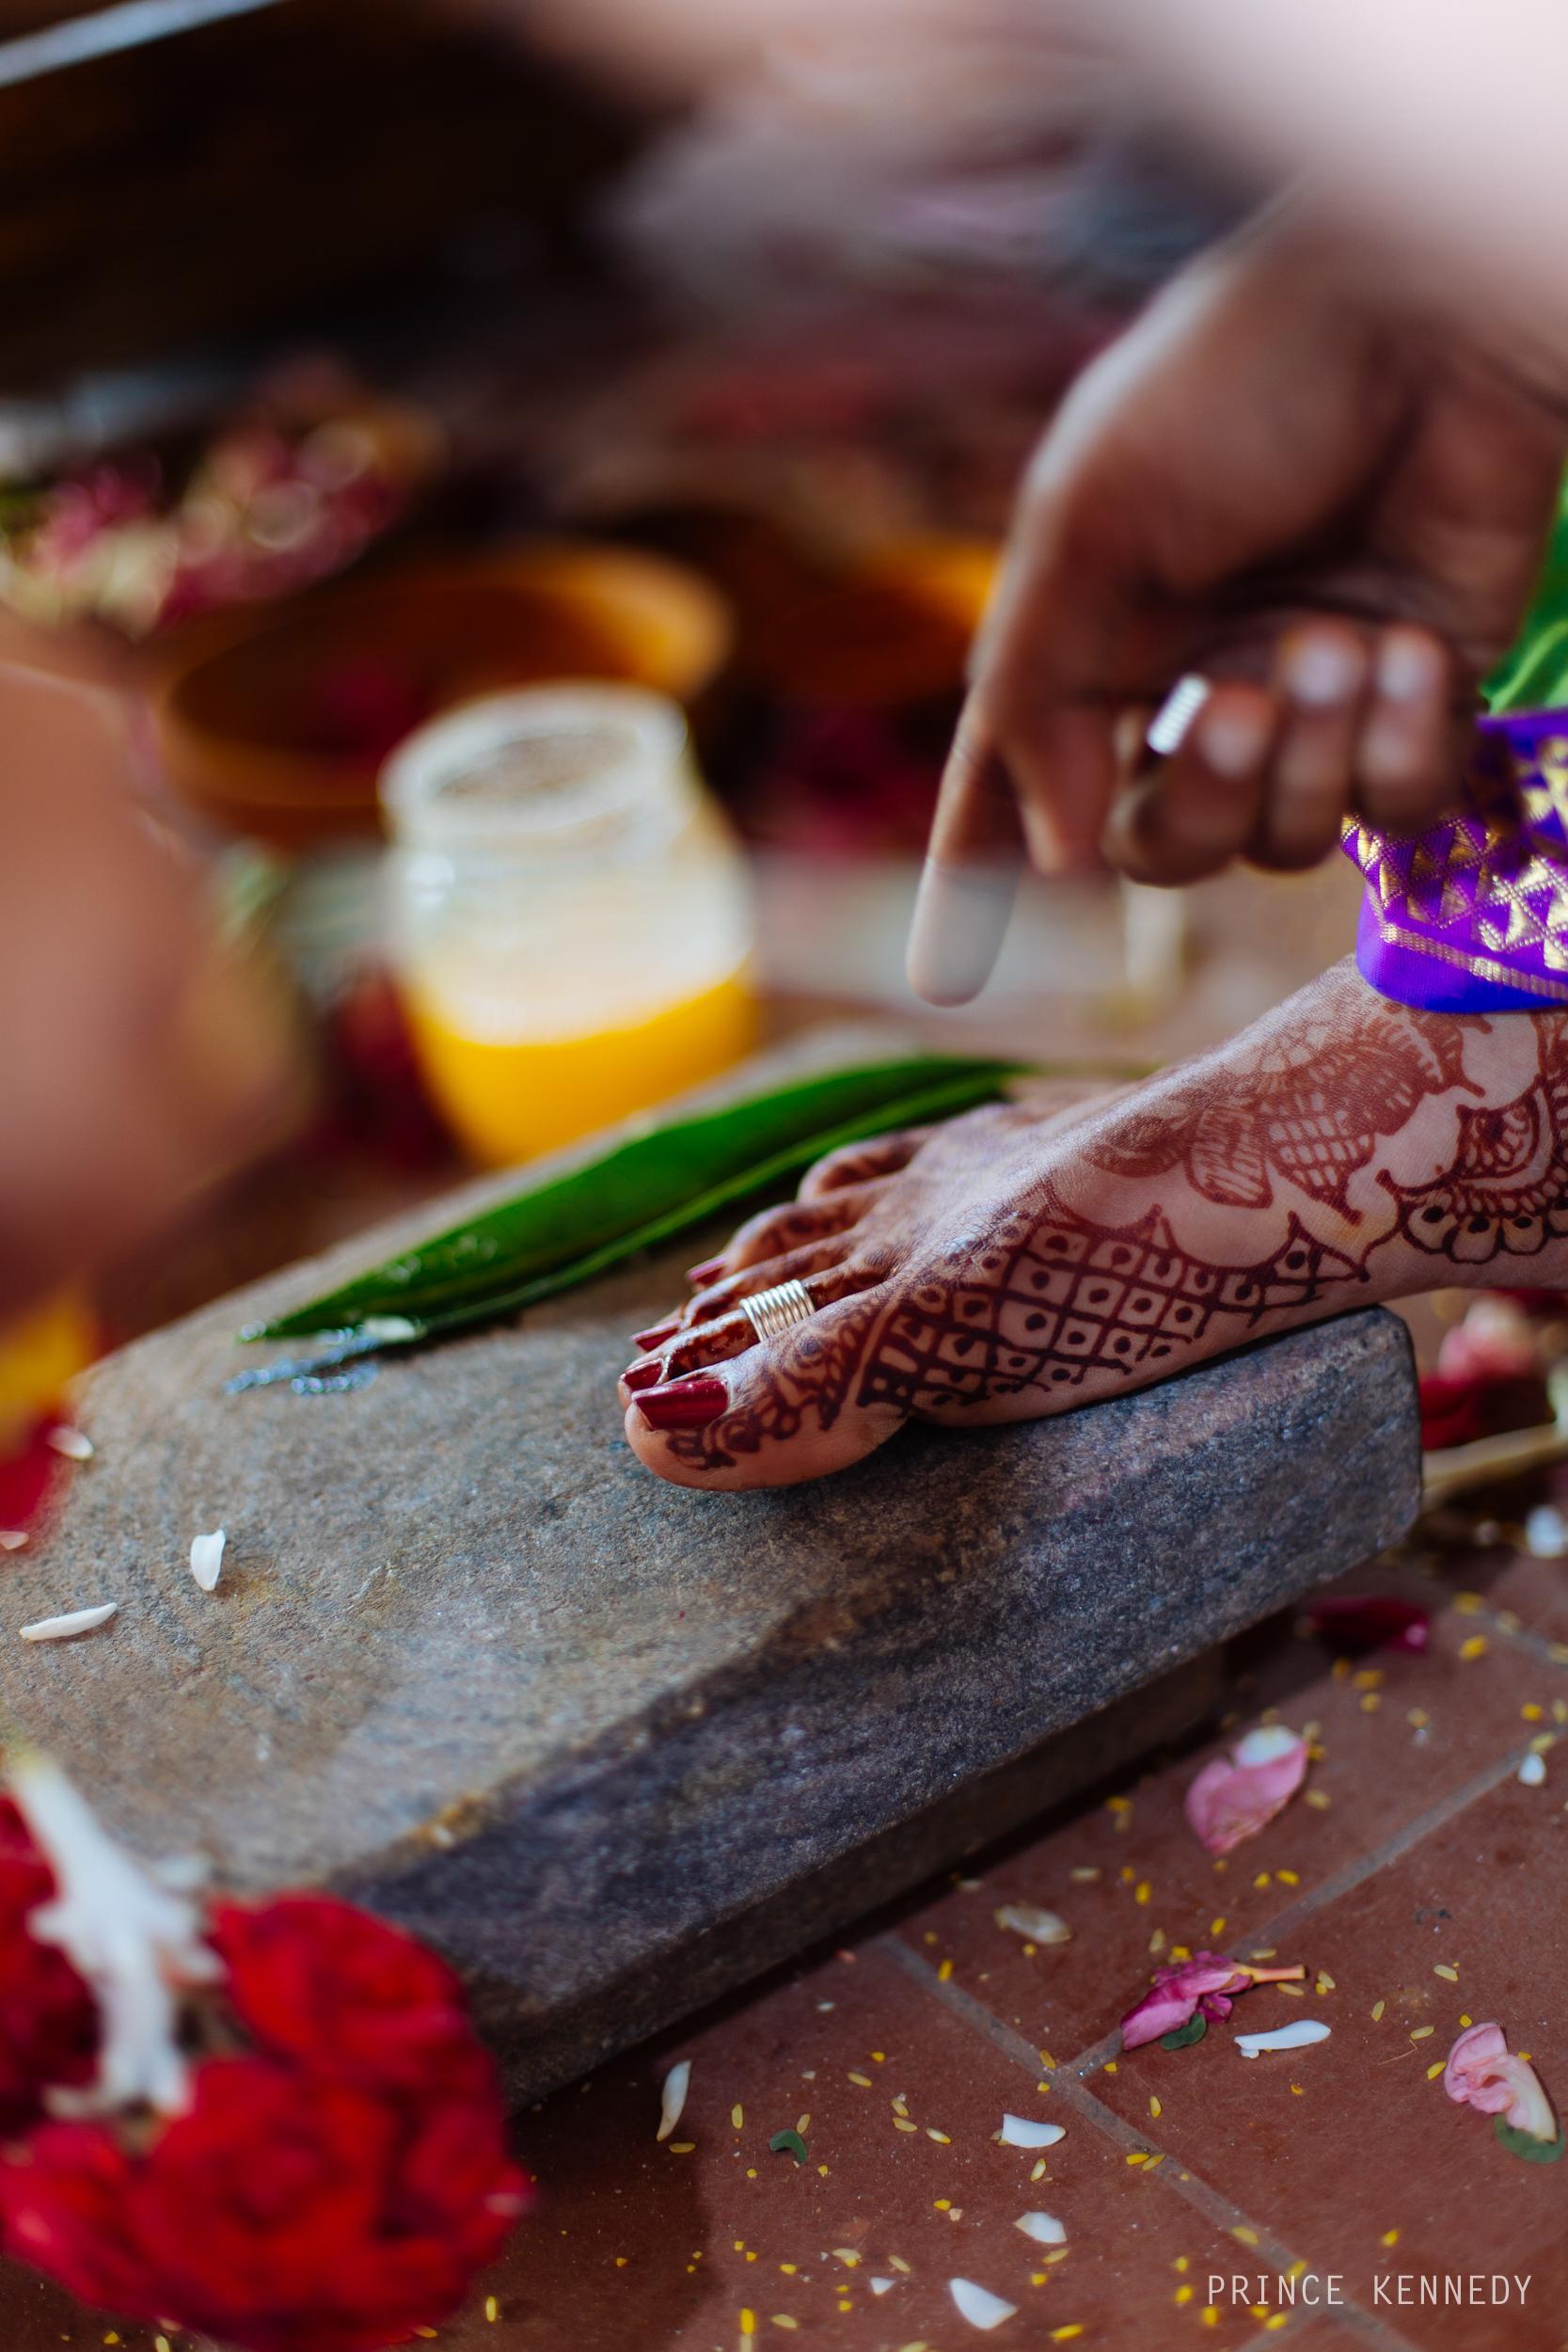 Athmajja-Nithesh-Engagement-Couple-Portrait-Portraiture-Wedding-Couple-Portrait-Chennai-Photographer-Candid-Photography-Destination-Best-Prince-Kennedy-Photography-319.jpg